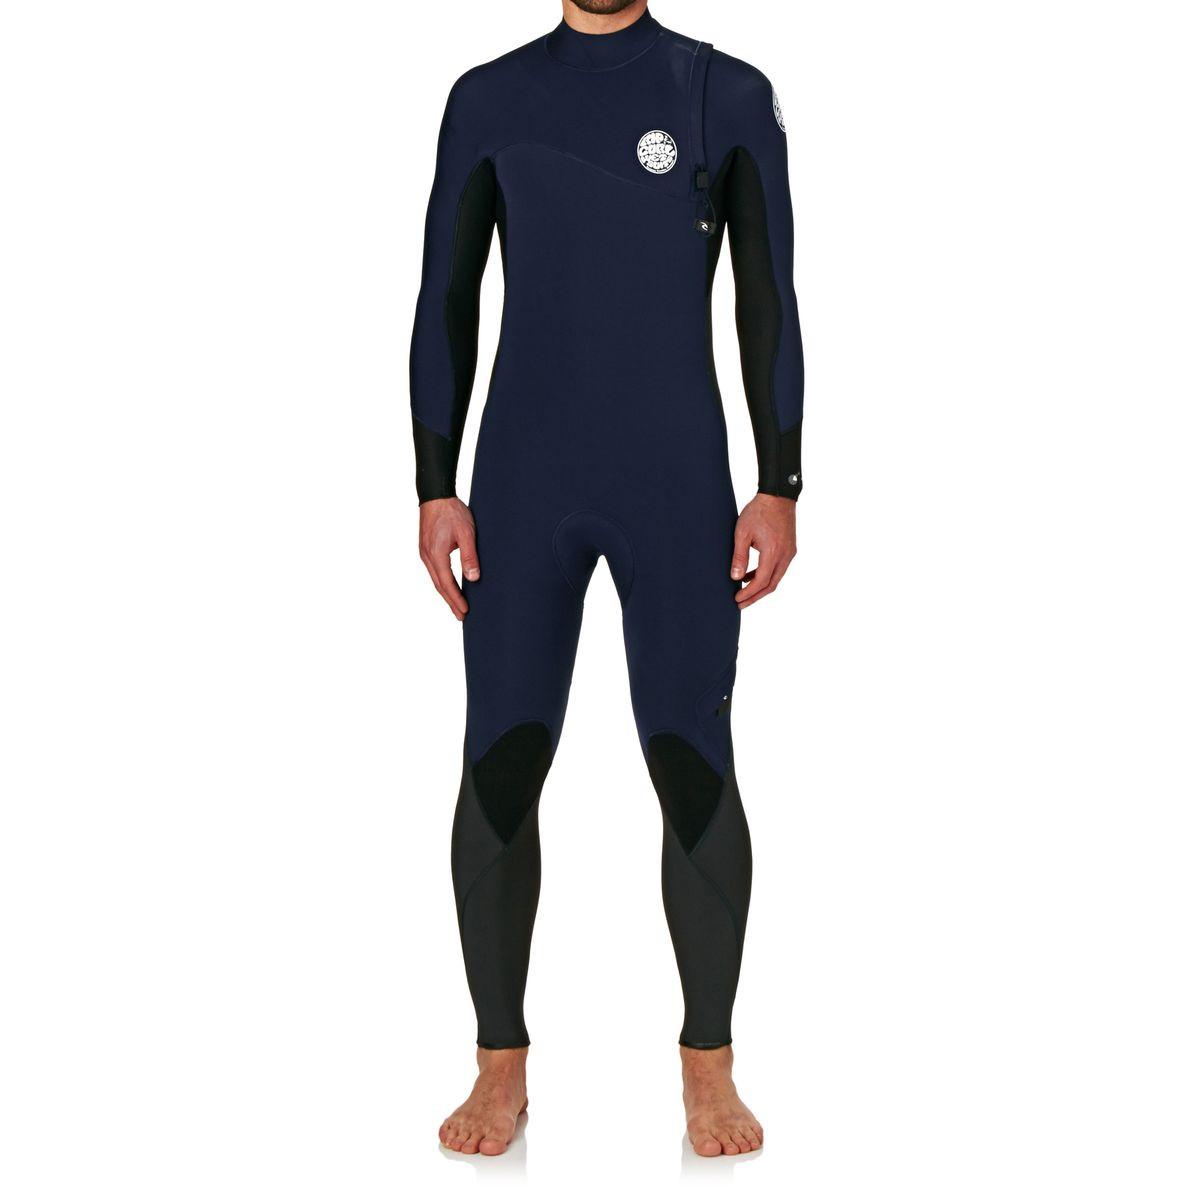 Rip Curl Flashbomb 3/2mm Zipperless Wetsuit - Navy